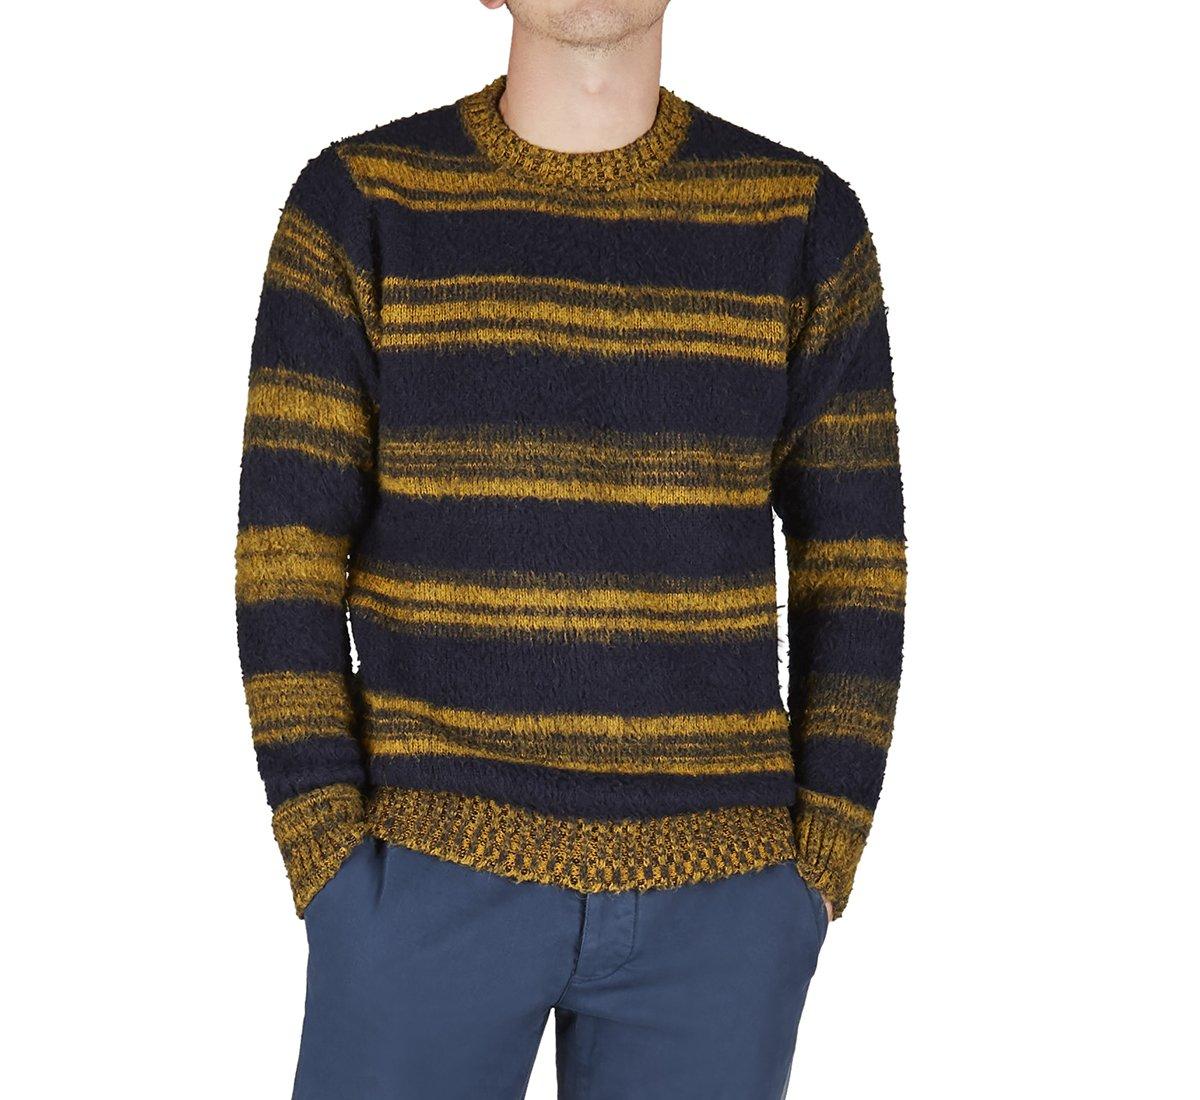 Pullover in calda lana e tessuto